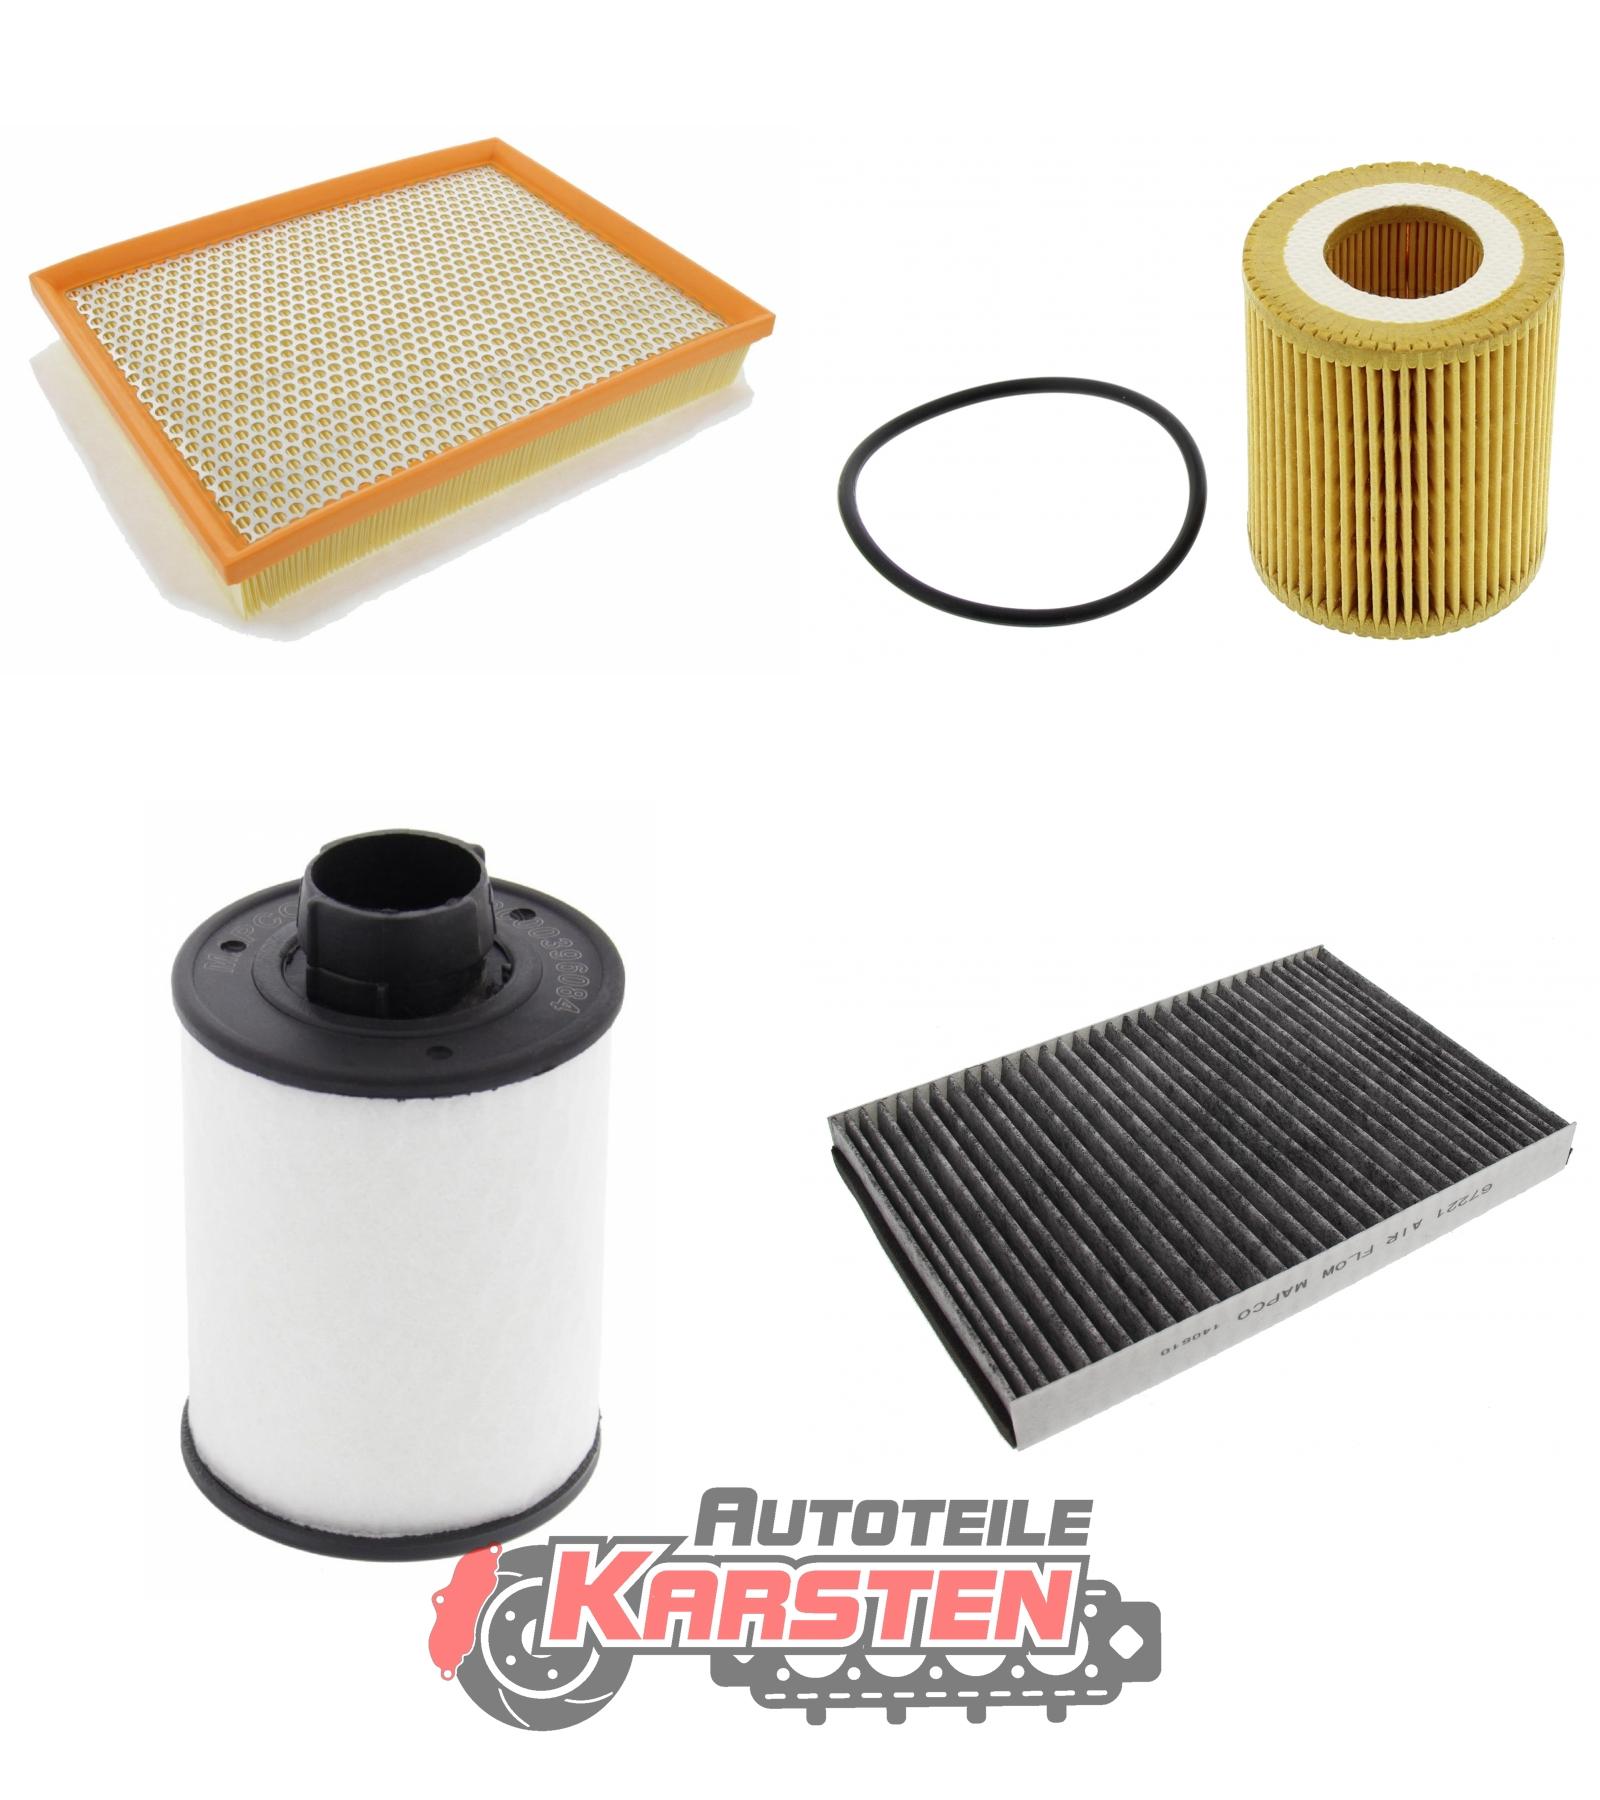 1x Kraftstofffilter 1x Innenraumfil FilterSet L 1x Luftfilter : 1x Ölfilter